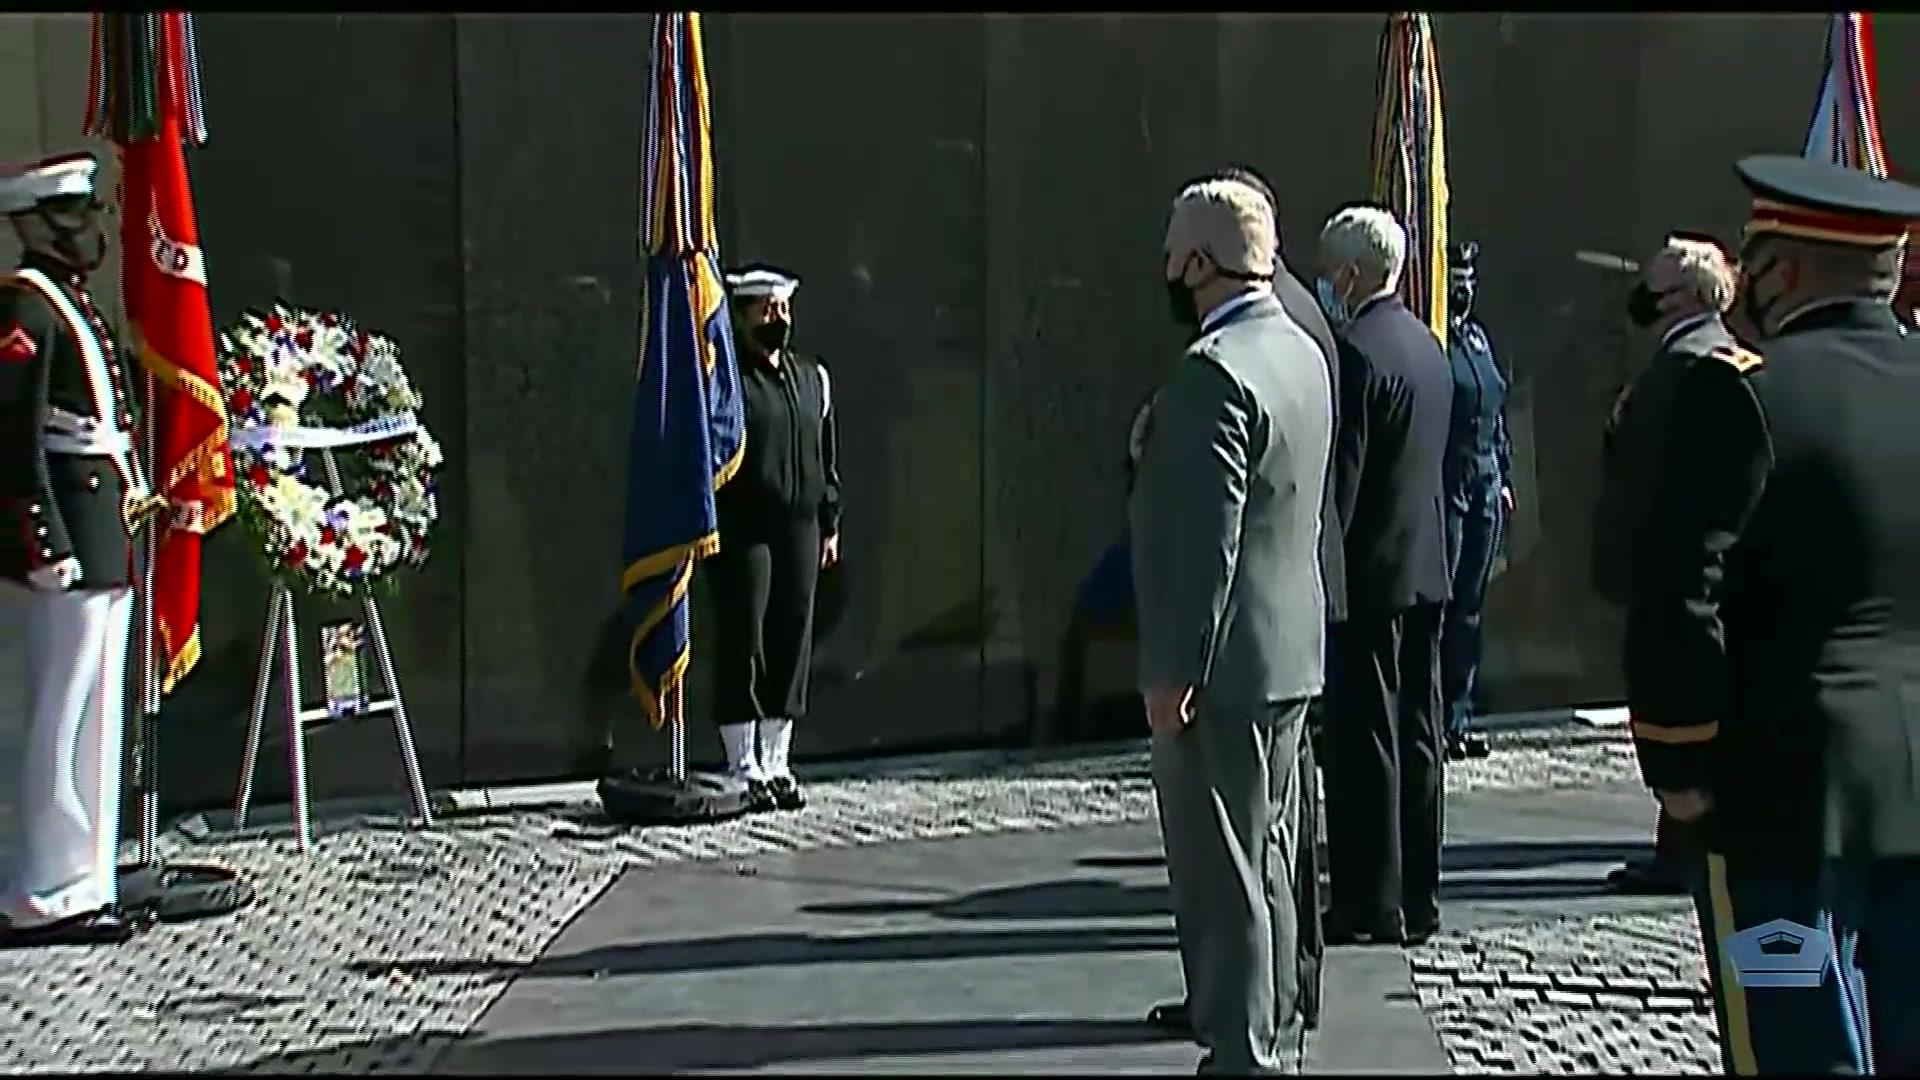 Secretary of Defense Lloyd J. Austin III and Secretary of Veterans Affairs Denis R. McDonough honor Vietnam War veterans during a wreath-laying ceremony at the Vietnam Veterans Memorial in Washington, March 29, 2021.